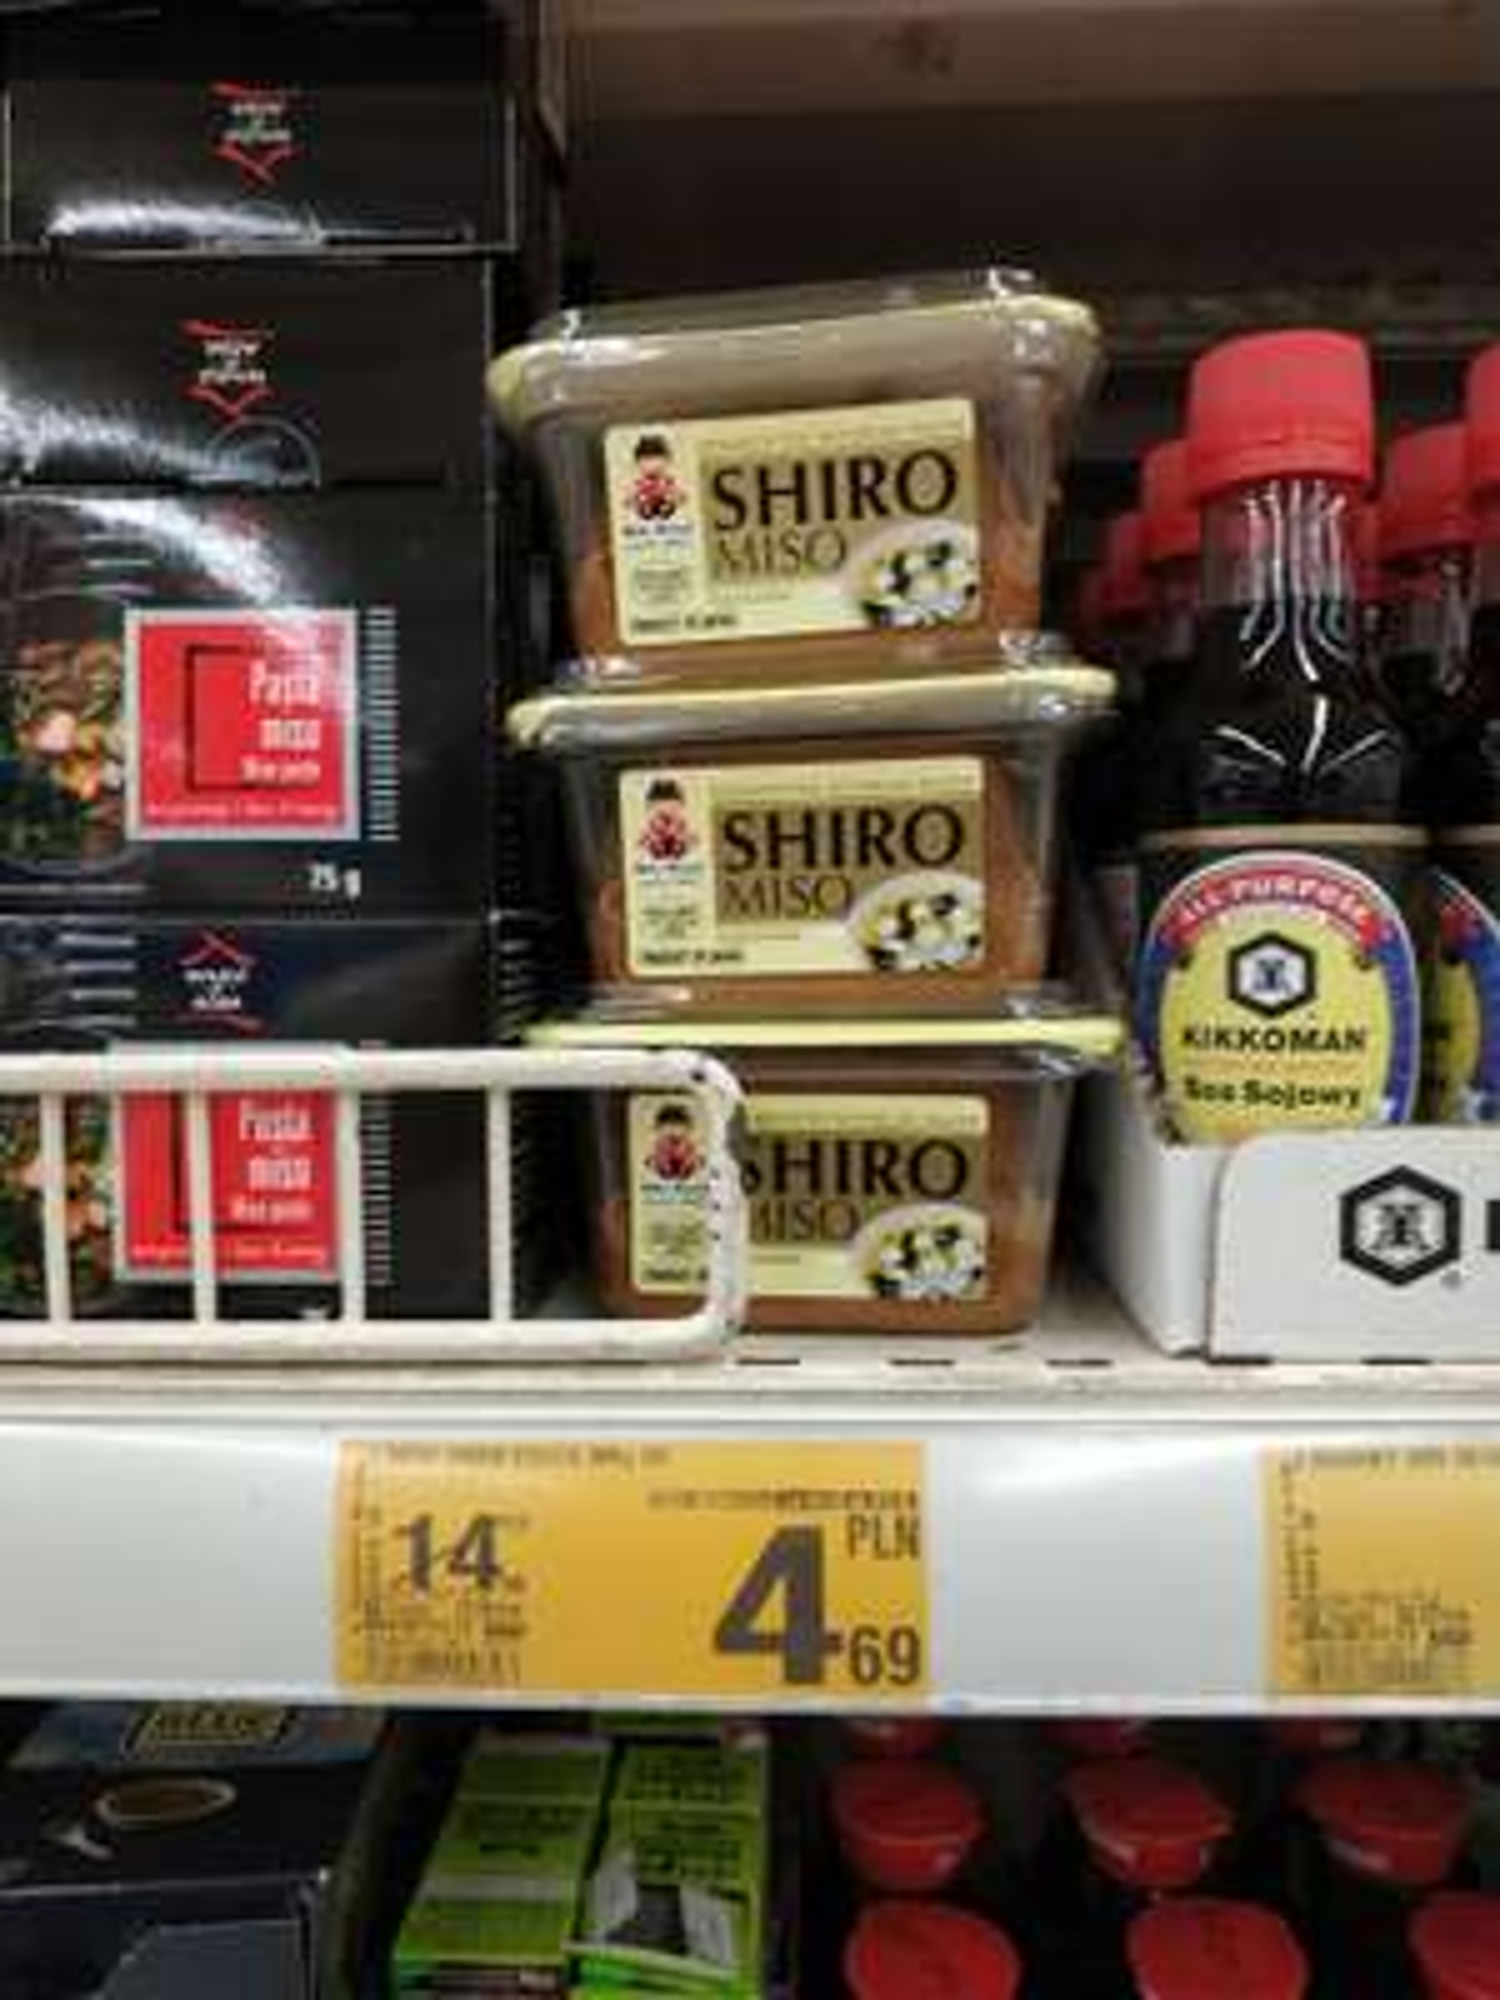 Pasta shiro miso 300g - Auchan Wola Park